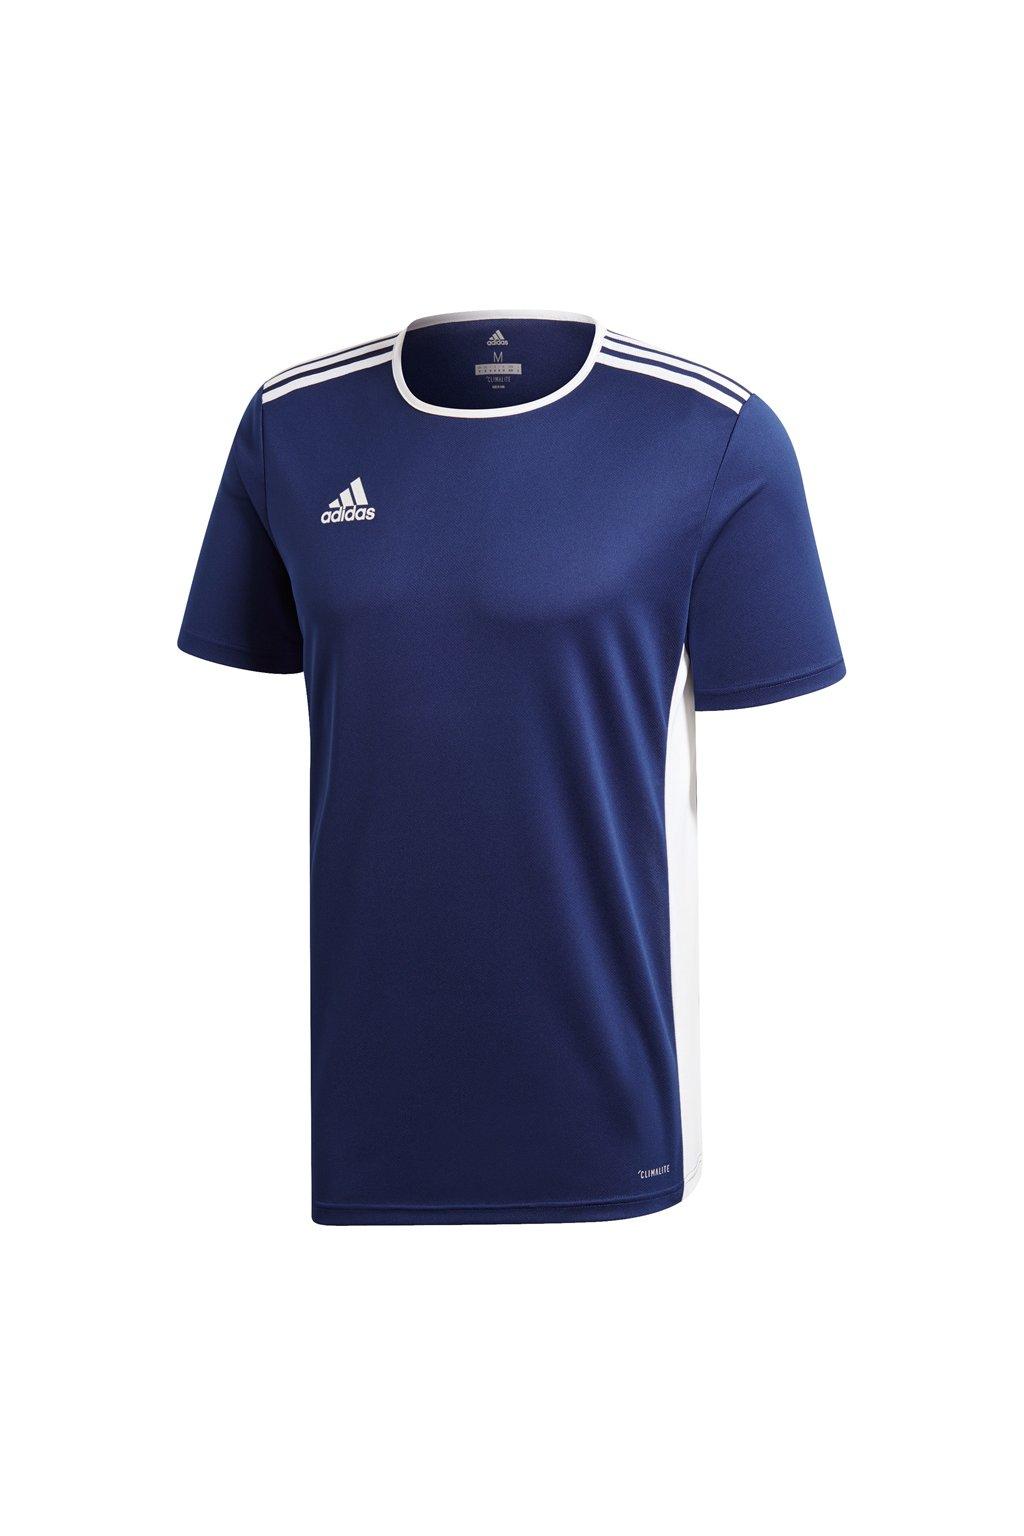 Detské tričko Adidas Entrada 18 Jersey JUNIOR námornícka modrá CF1036